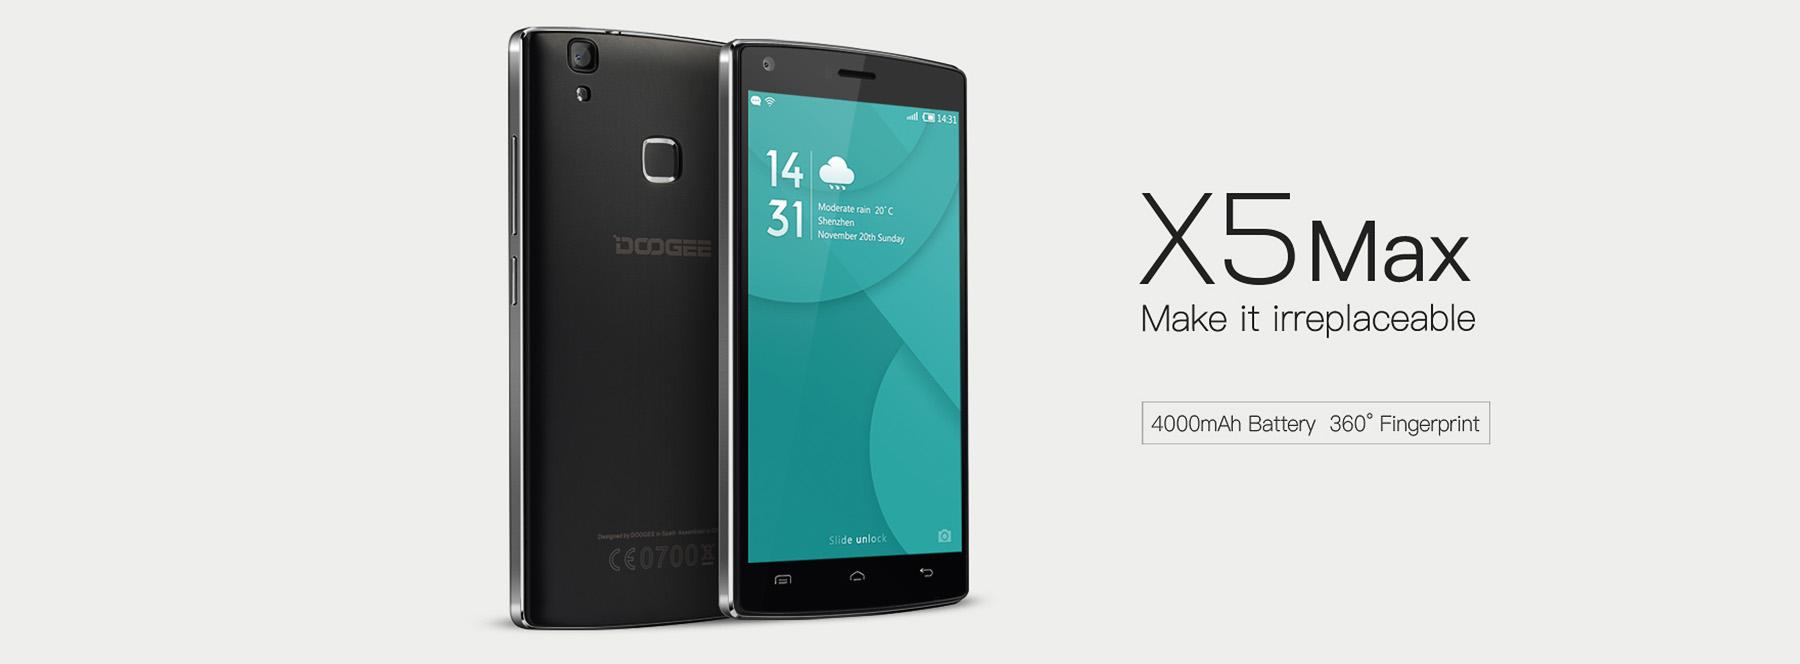 doogee x5 max 1 Inca o lansare noua in China, DOOGEE X5 MAX. Dar de ce MAX?